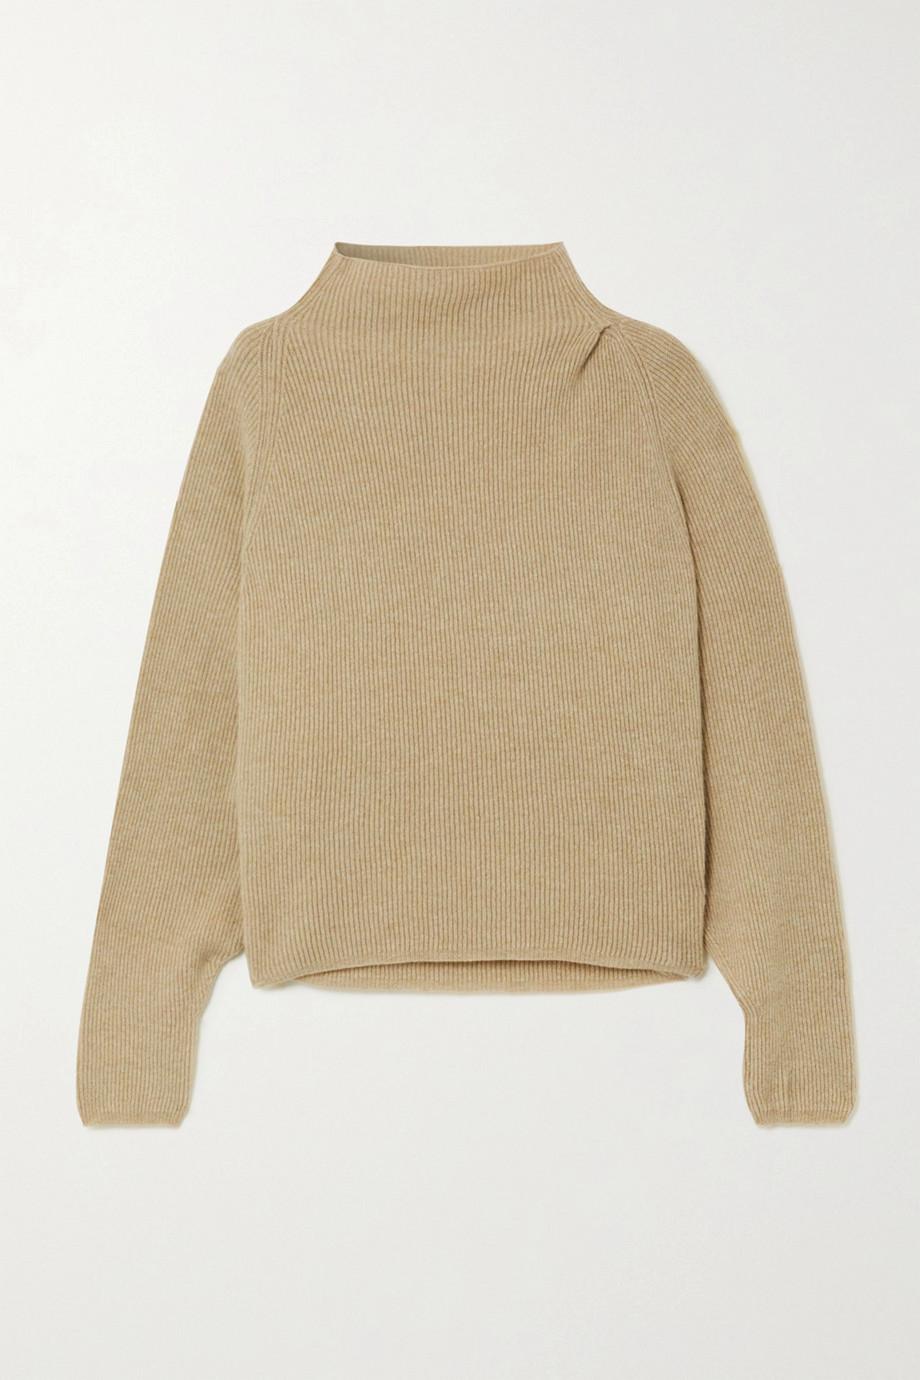 Petar Petrov Karoll ribbed cashmere sweater